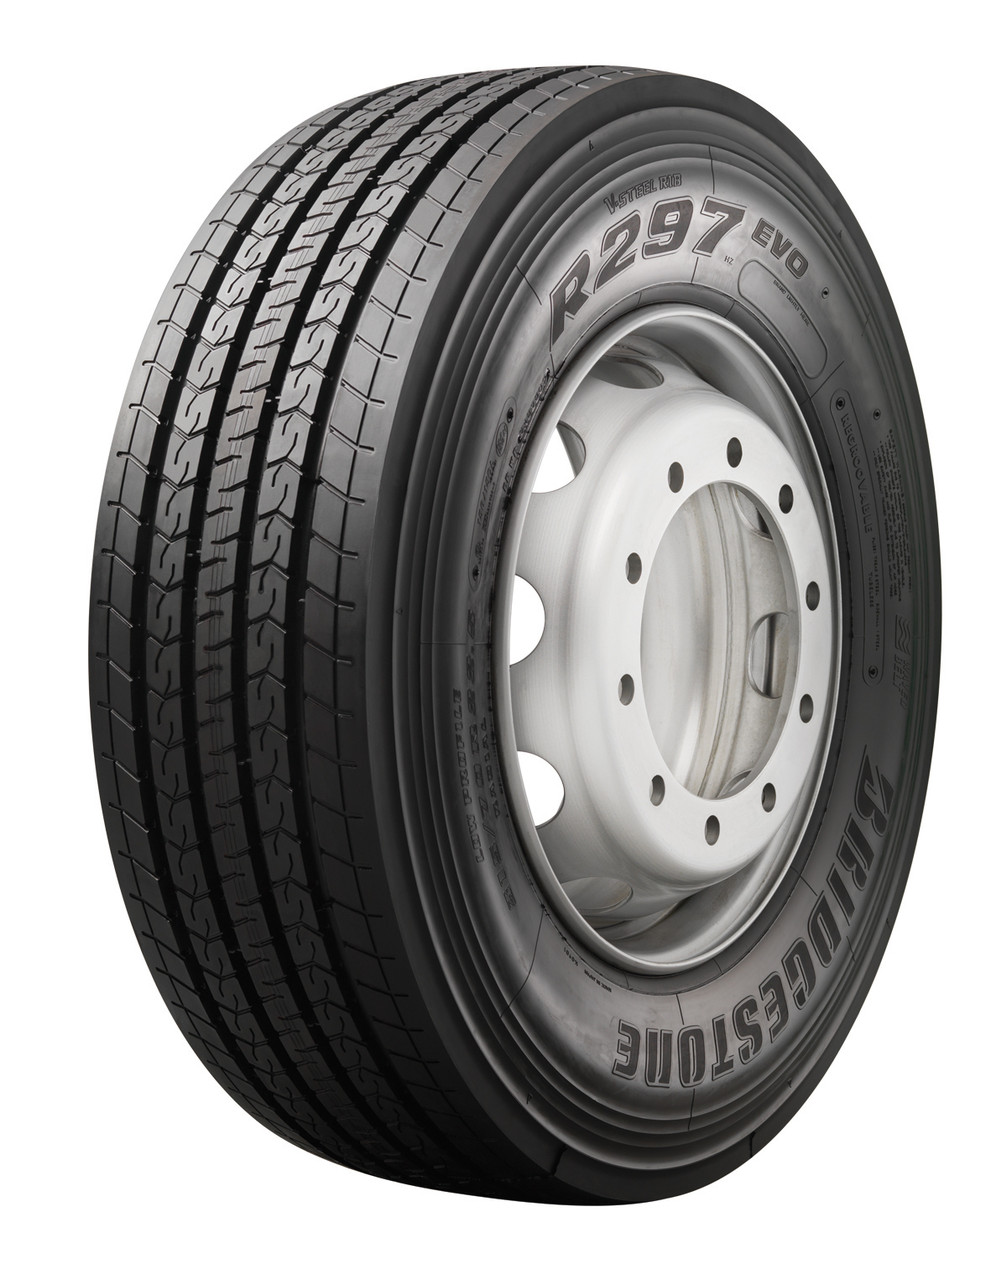 Грузовые шины Bridgestone R297, 315 80 R22.5